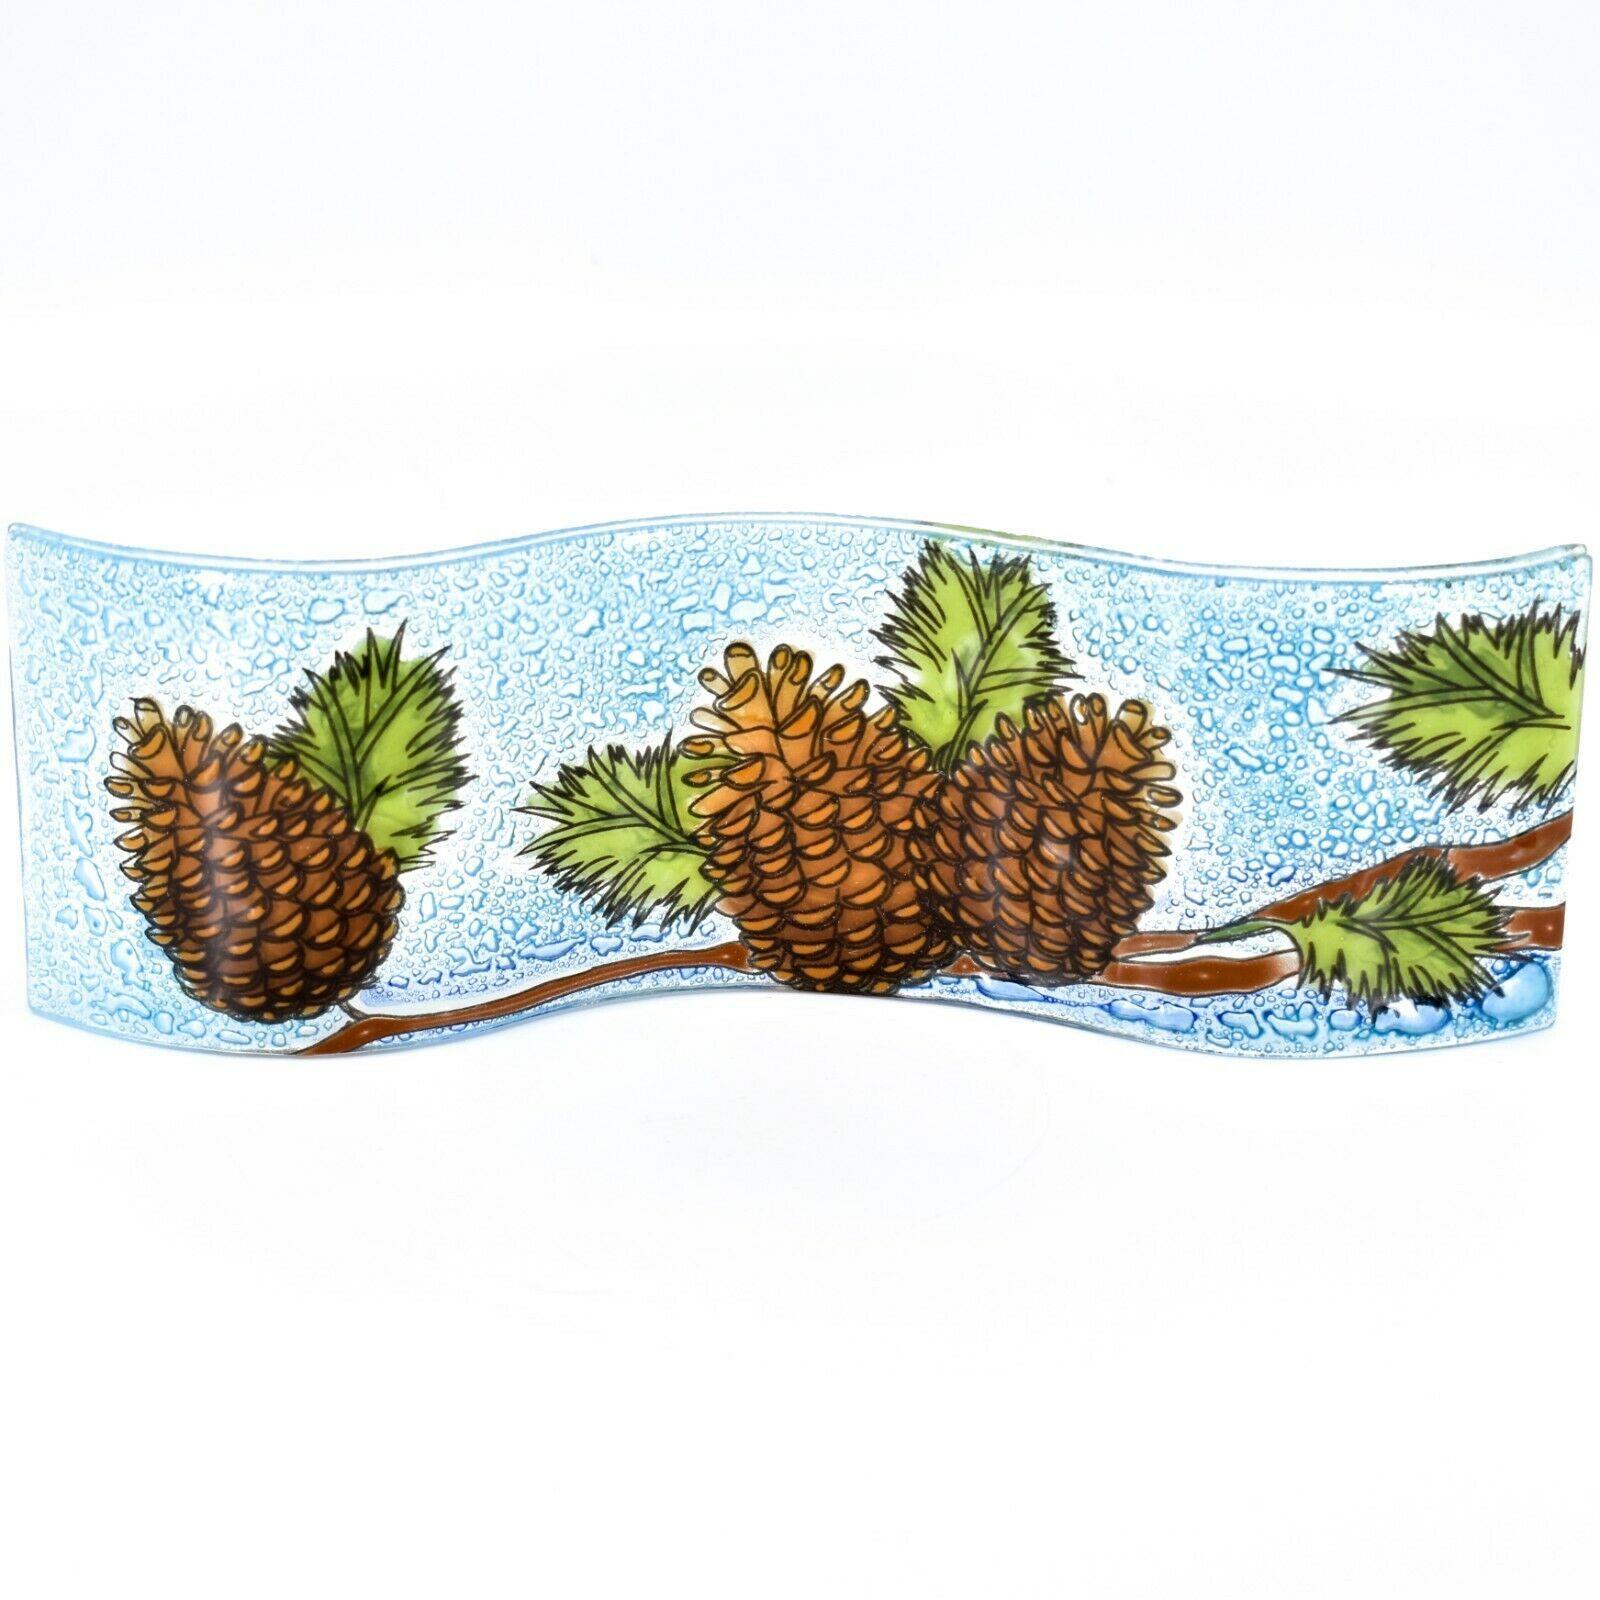 Fused Art Glass Winter Pinecones Wavy Decor Holiday Sun Catcher Handmade Ecuador